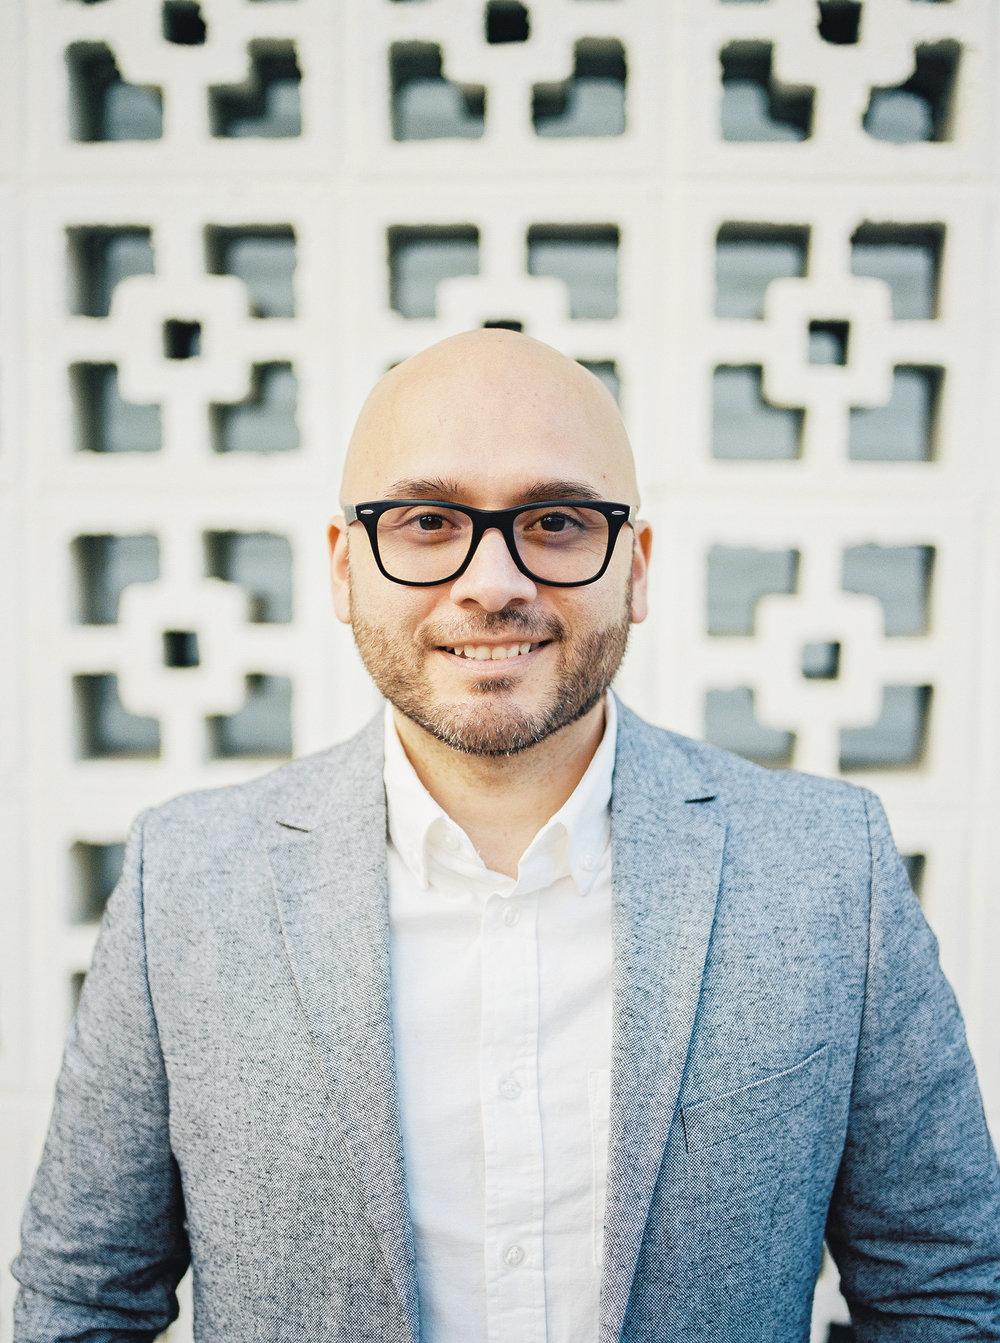 Miguel Garcia // Owner // Lead Videographer